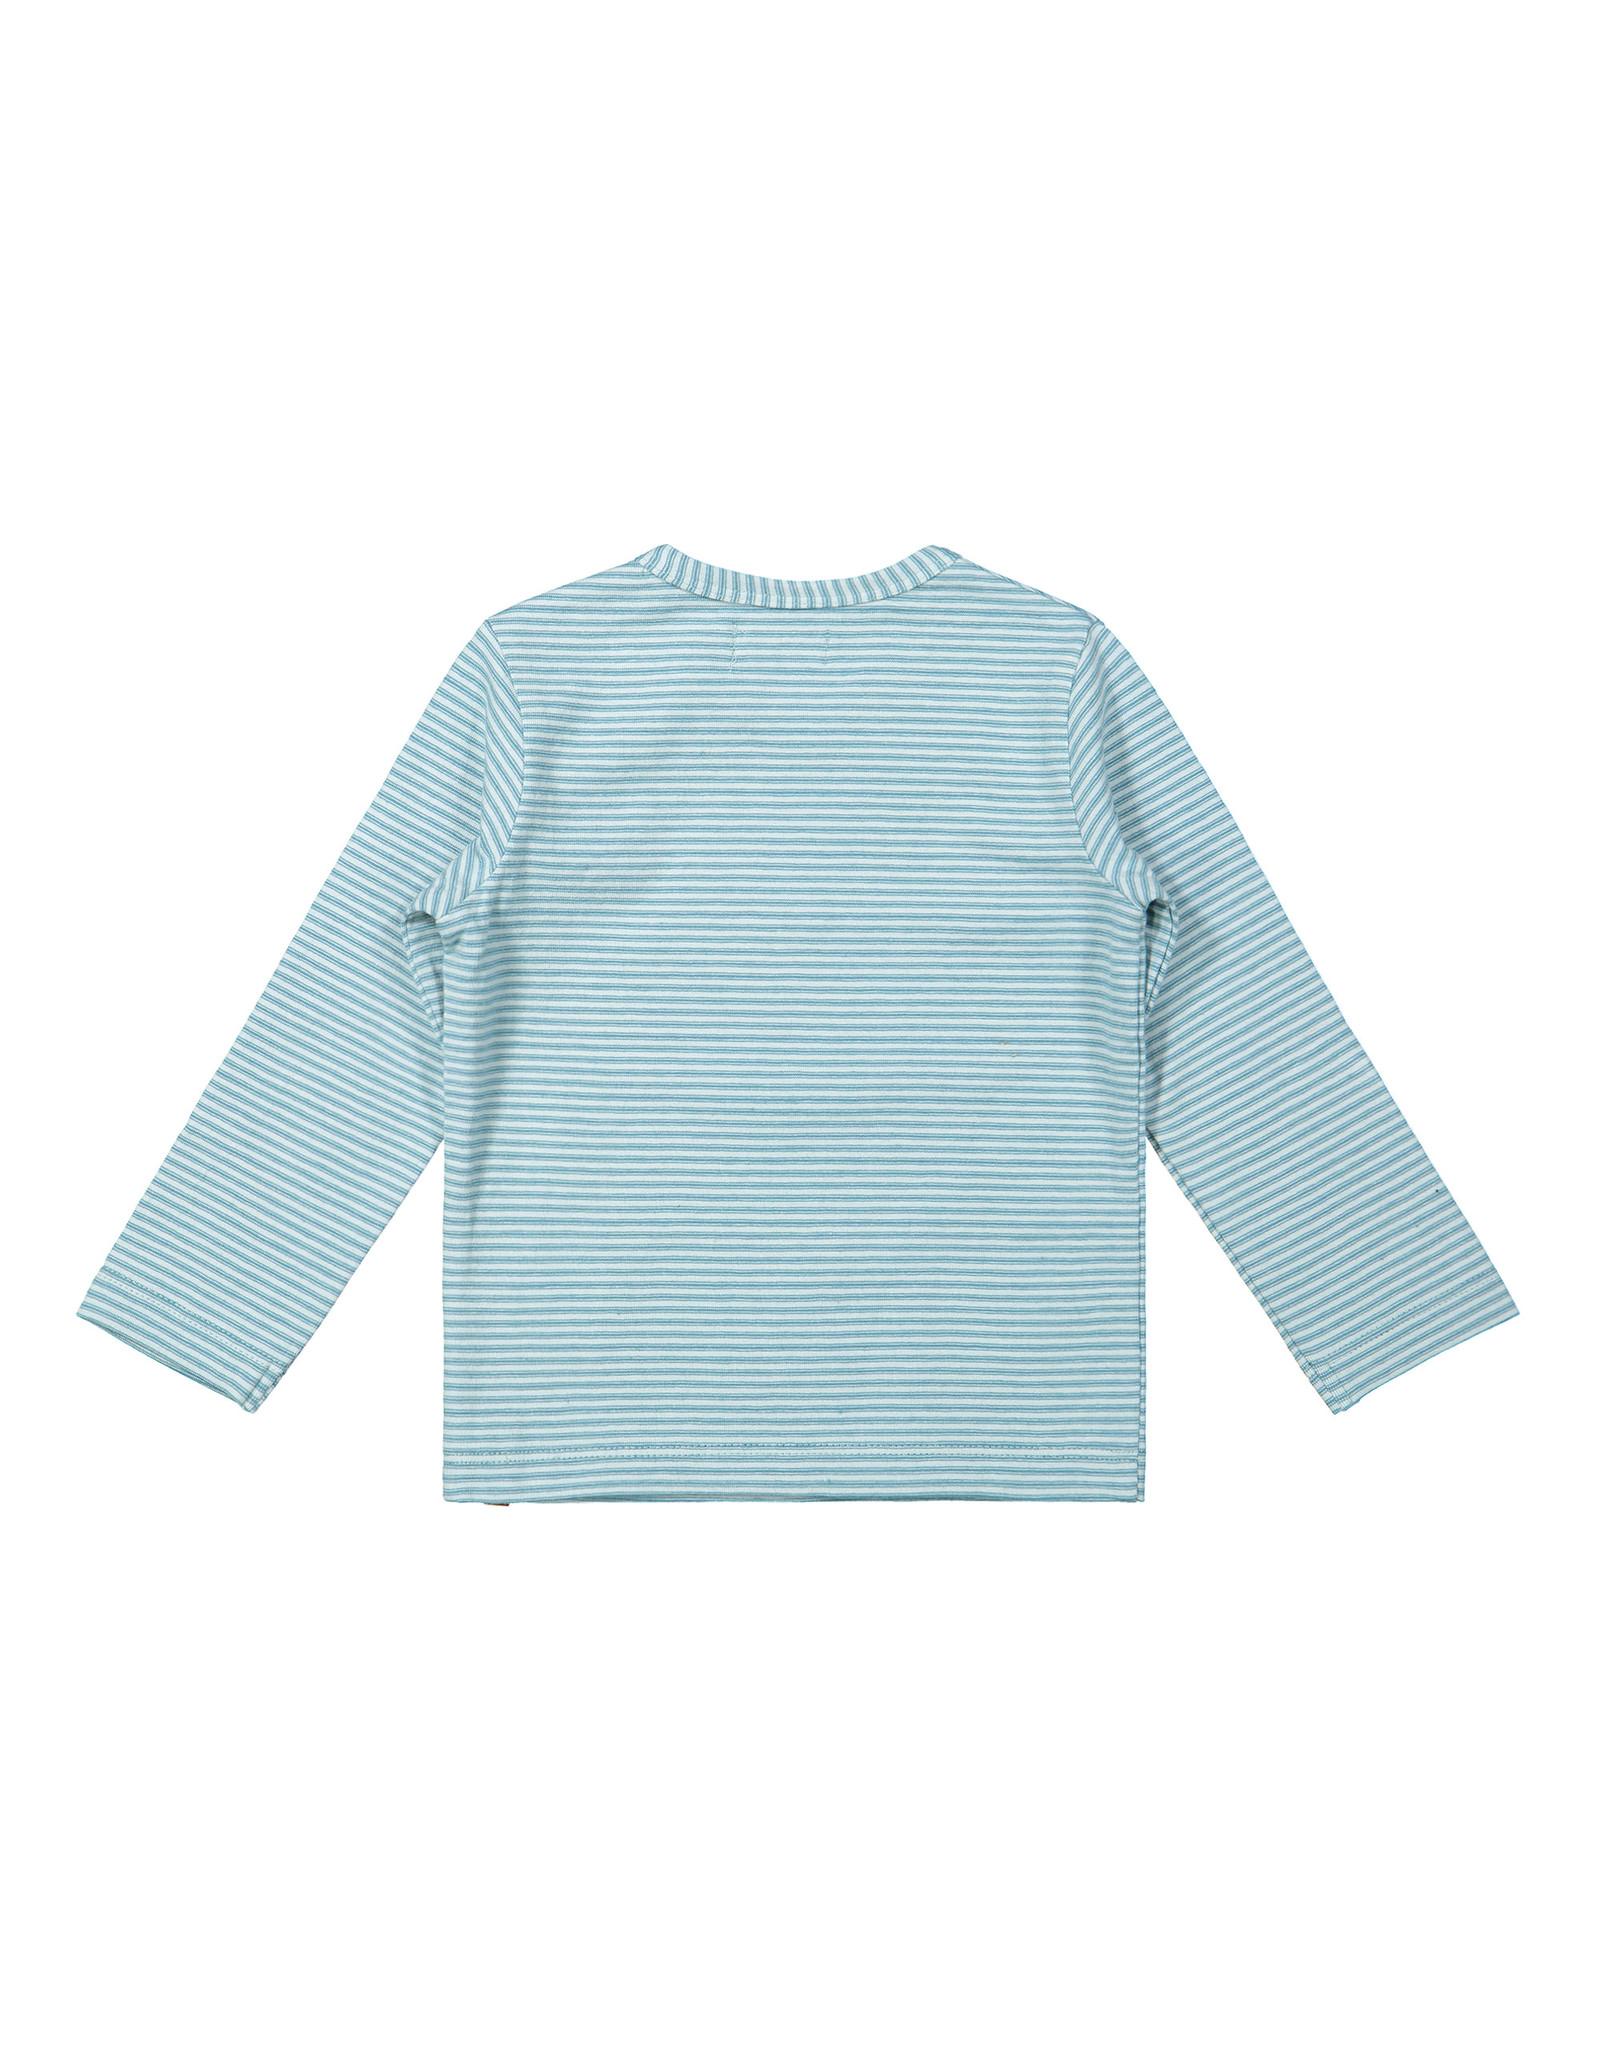 Dirkje Dirkje baby jongens gestreept shirt Explore Light Blue